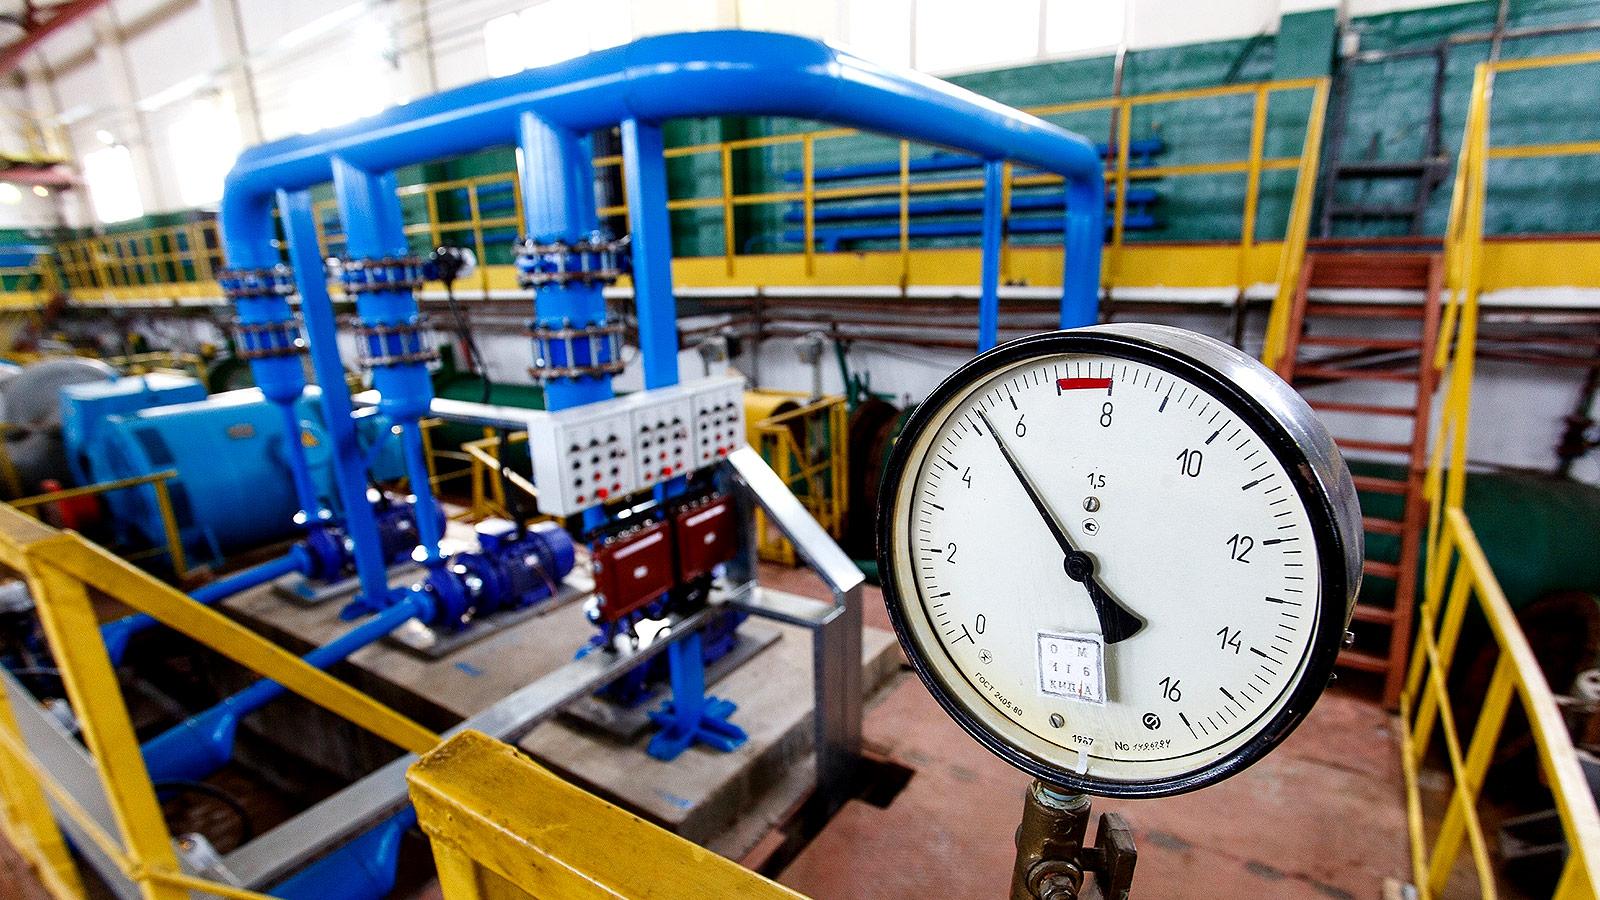 «Концессия водоснабжения» в Волгограде начала сотрудничество со школой